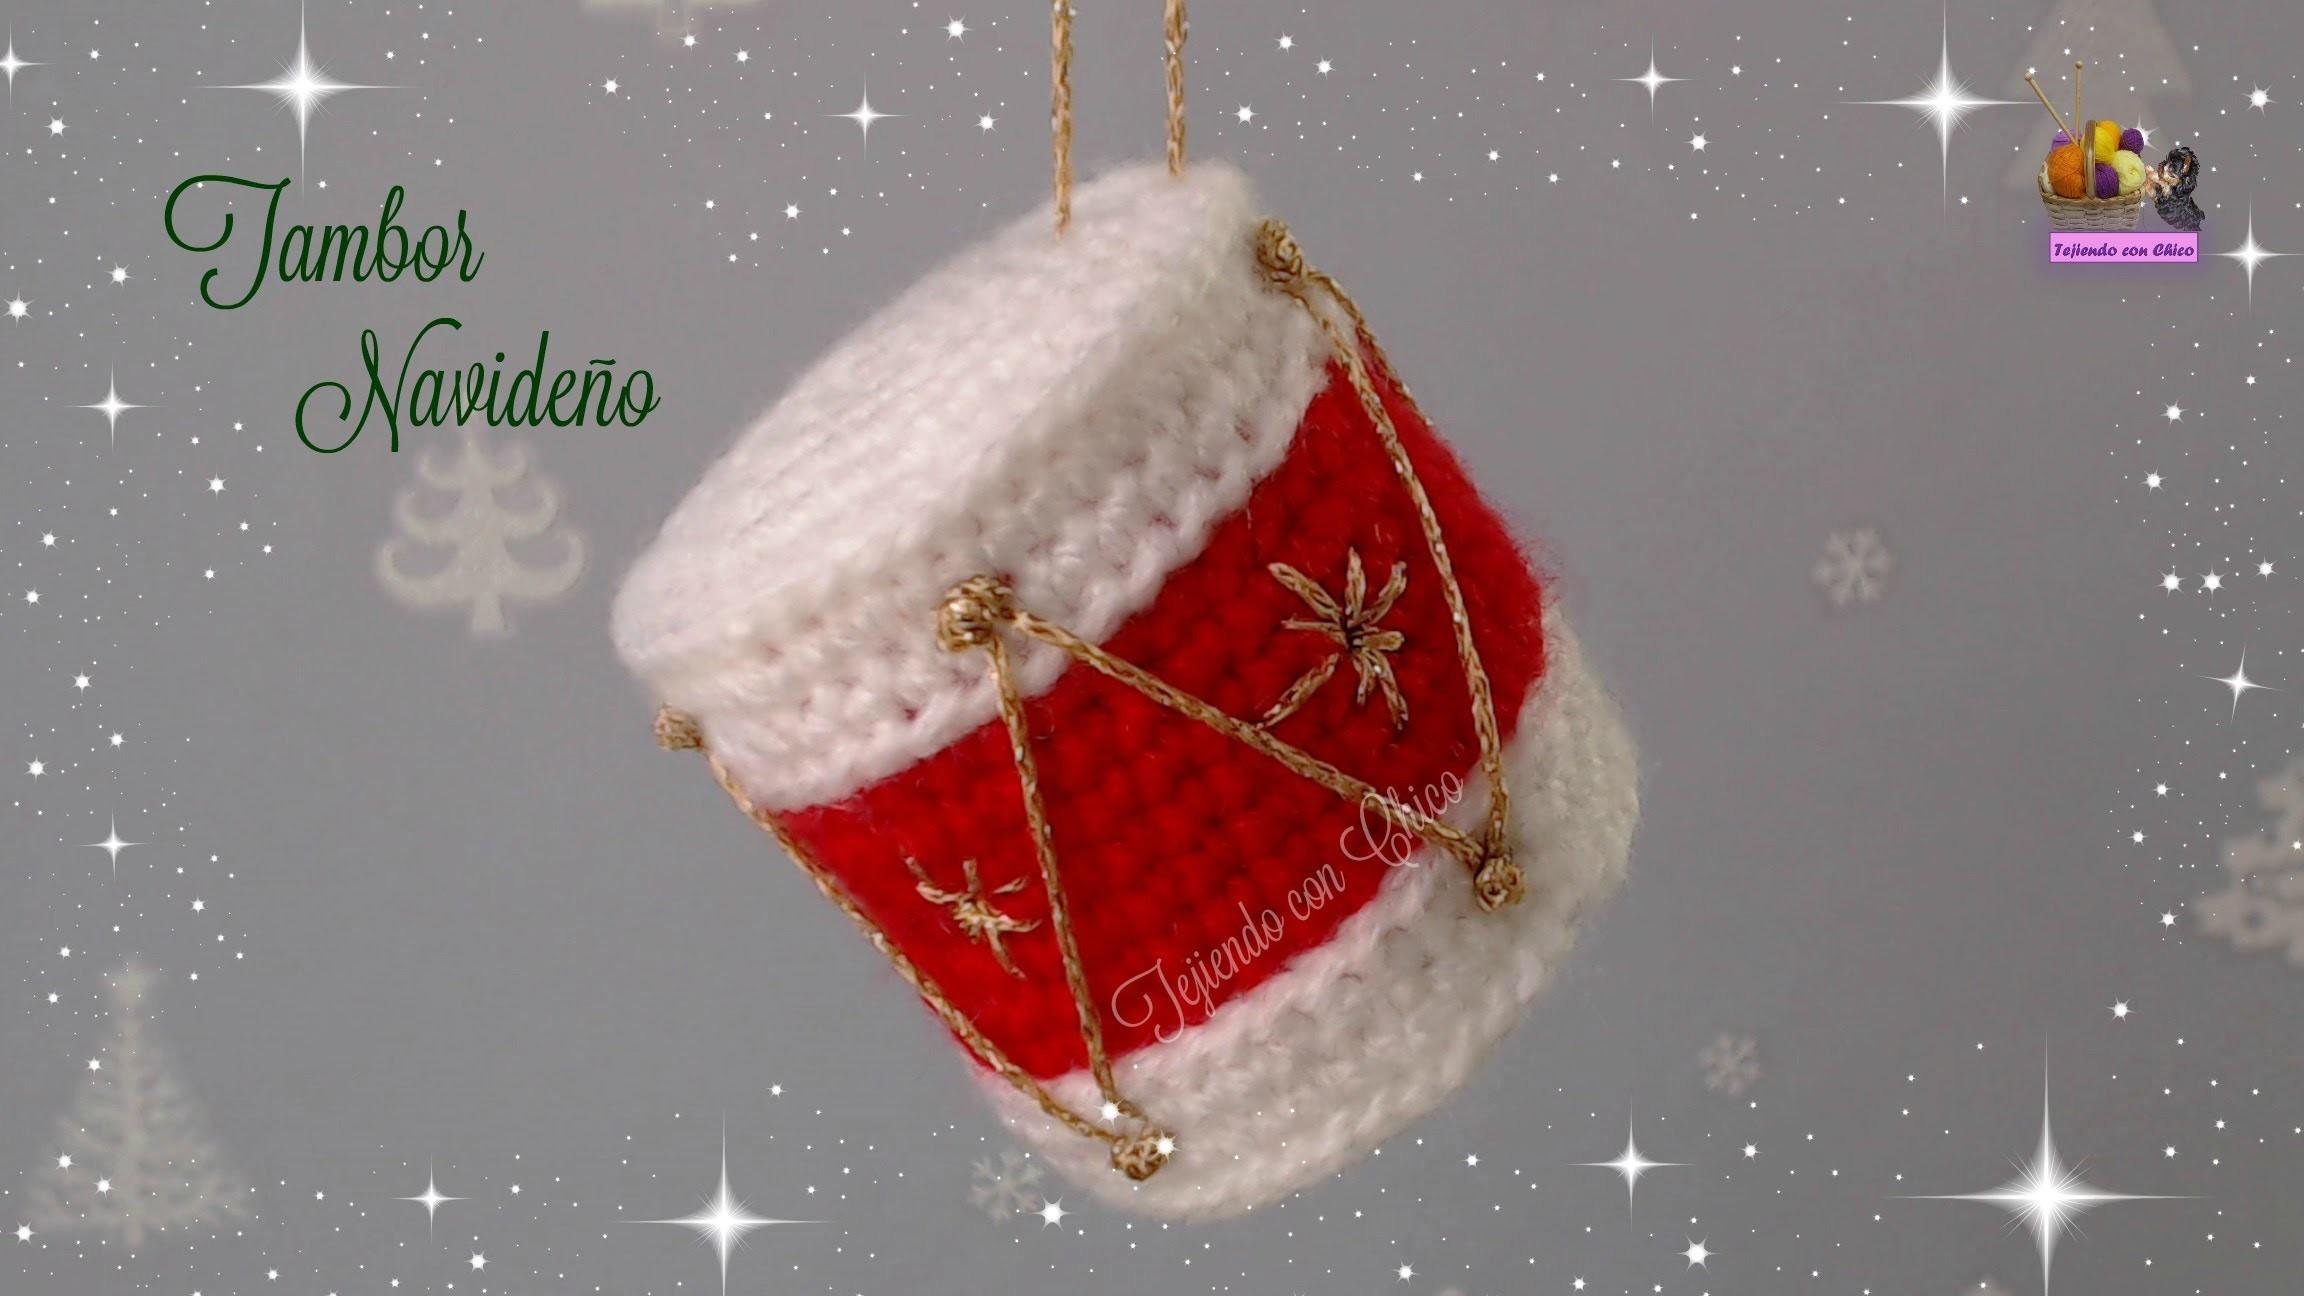 Tambor de crochet para adornar en Navidad